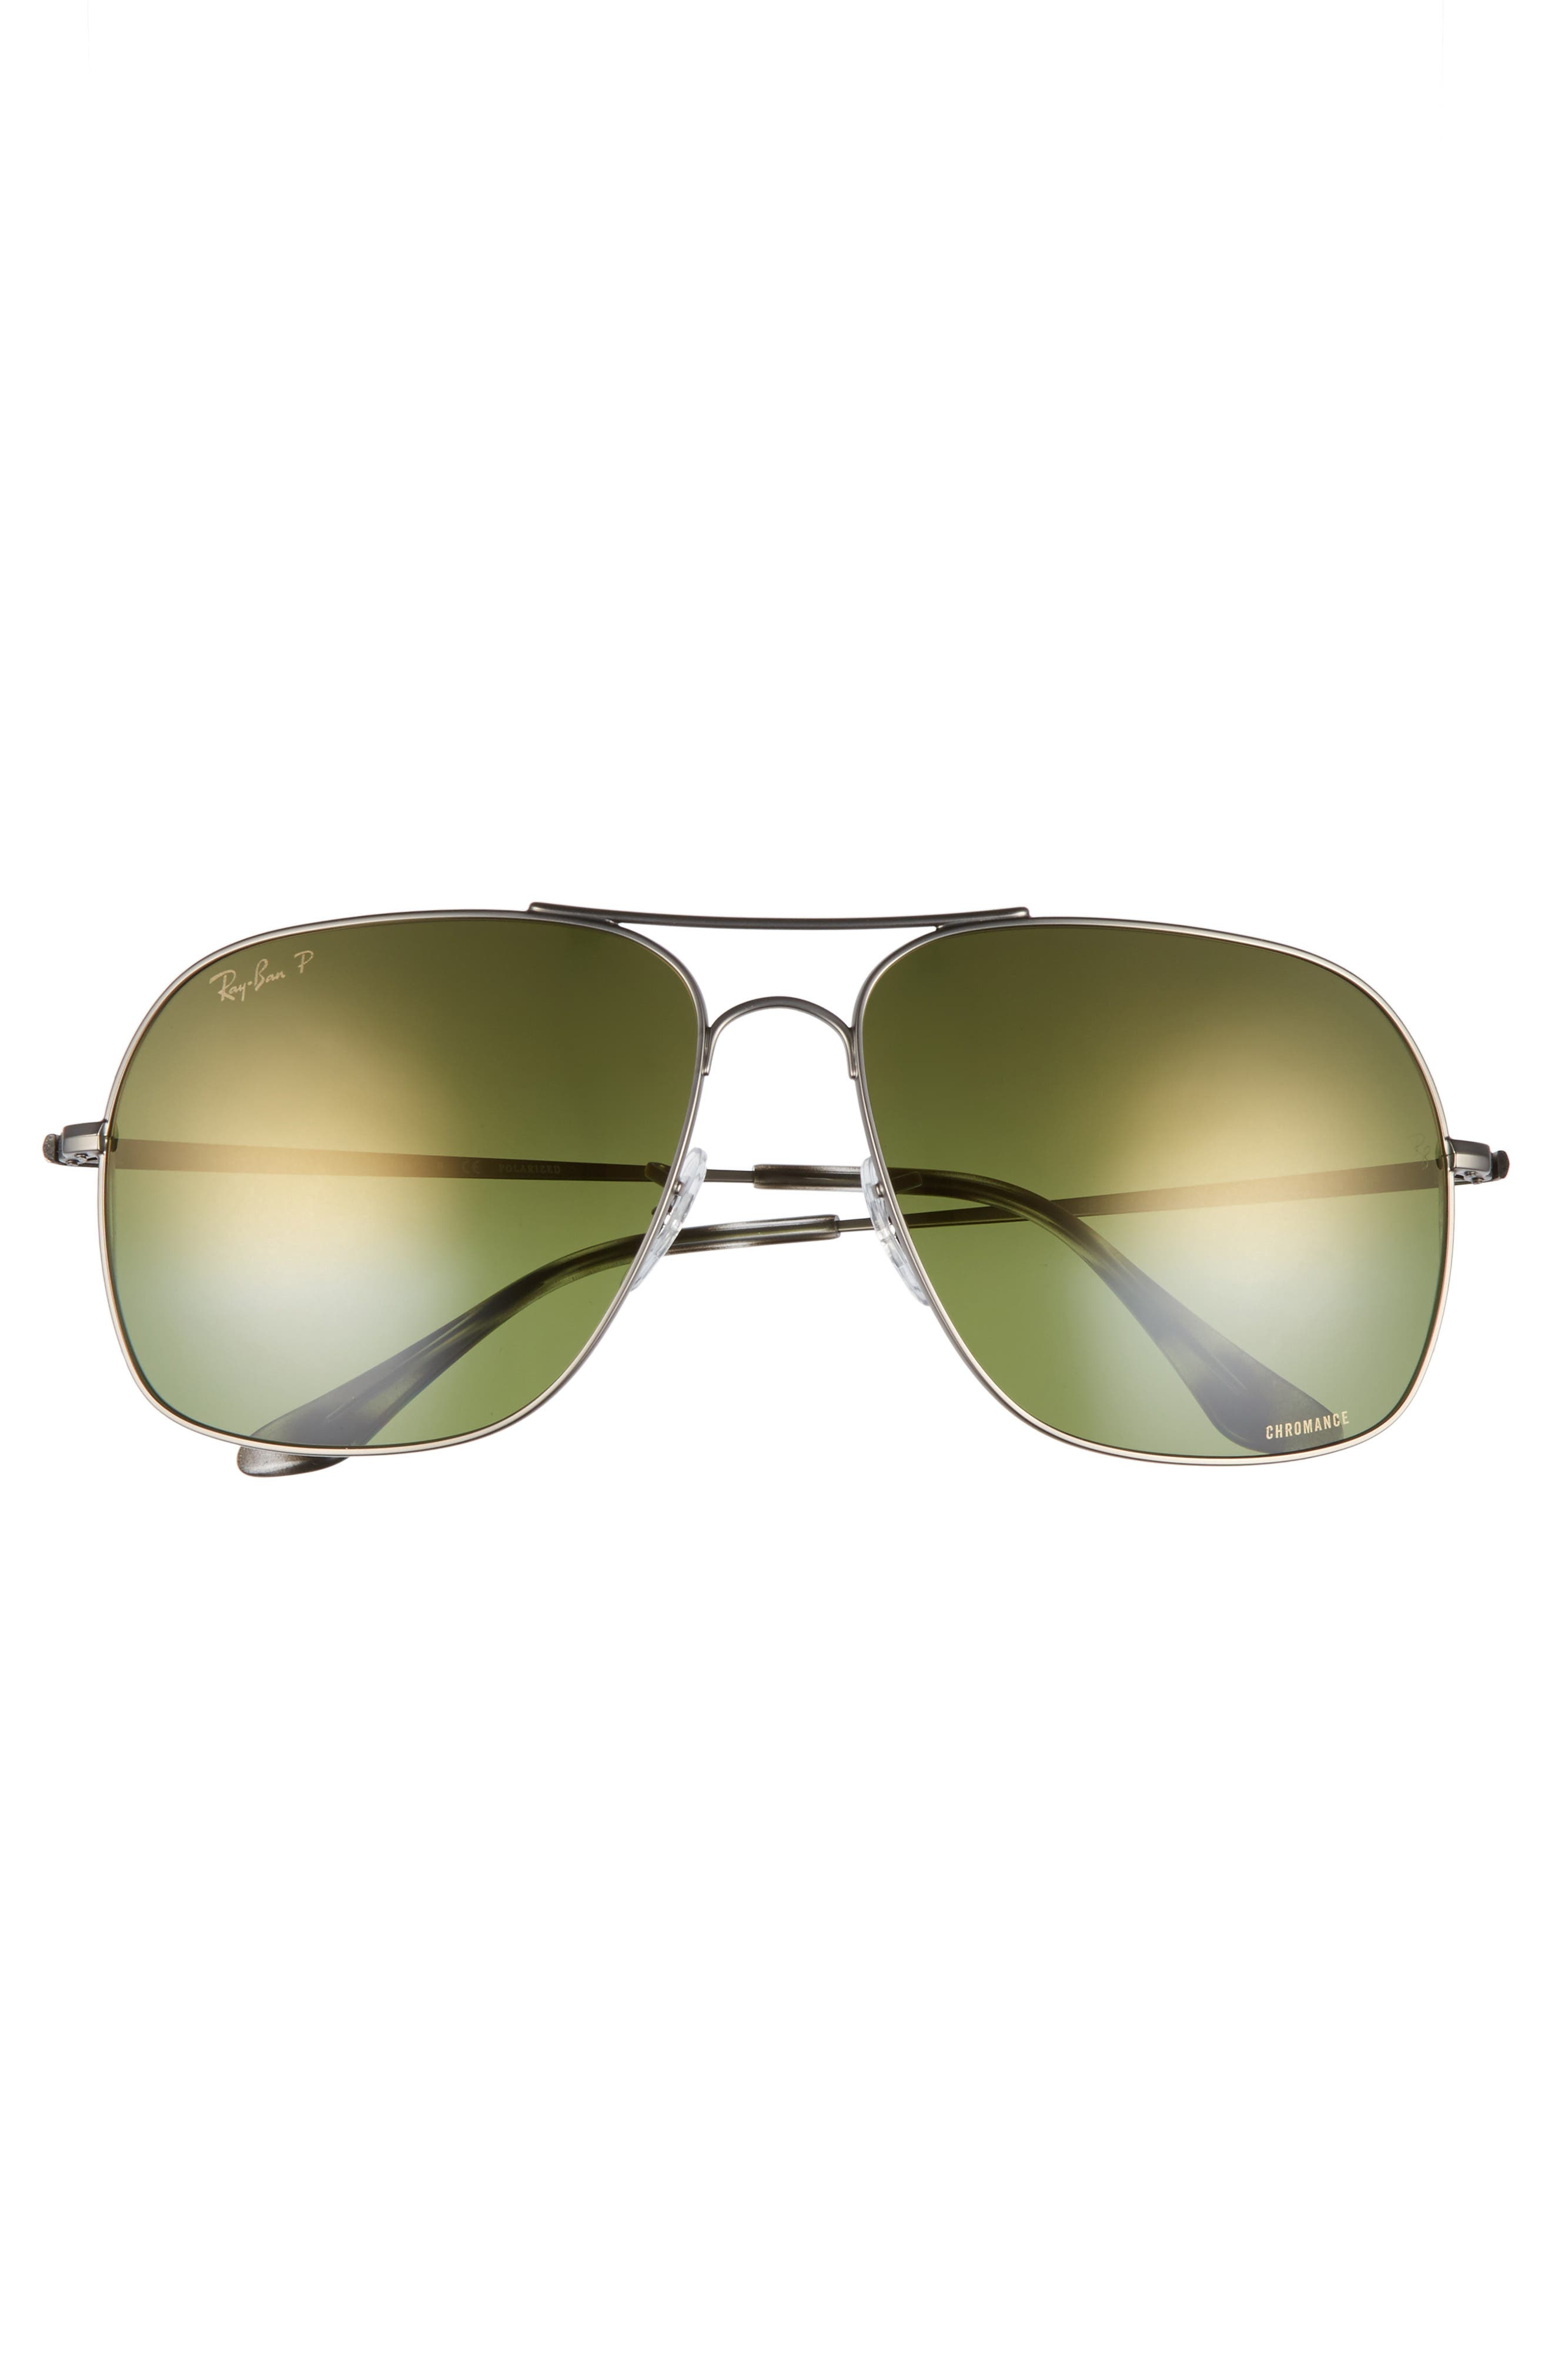 Chromance 61mm Double Bridge Aviator Sunglasses,                             Alternate thumbnail 2, color,                             Gunmetal/ Green